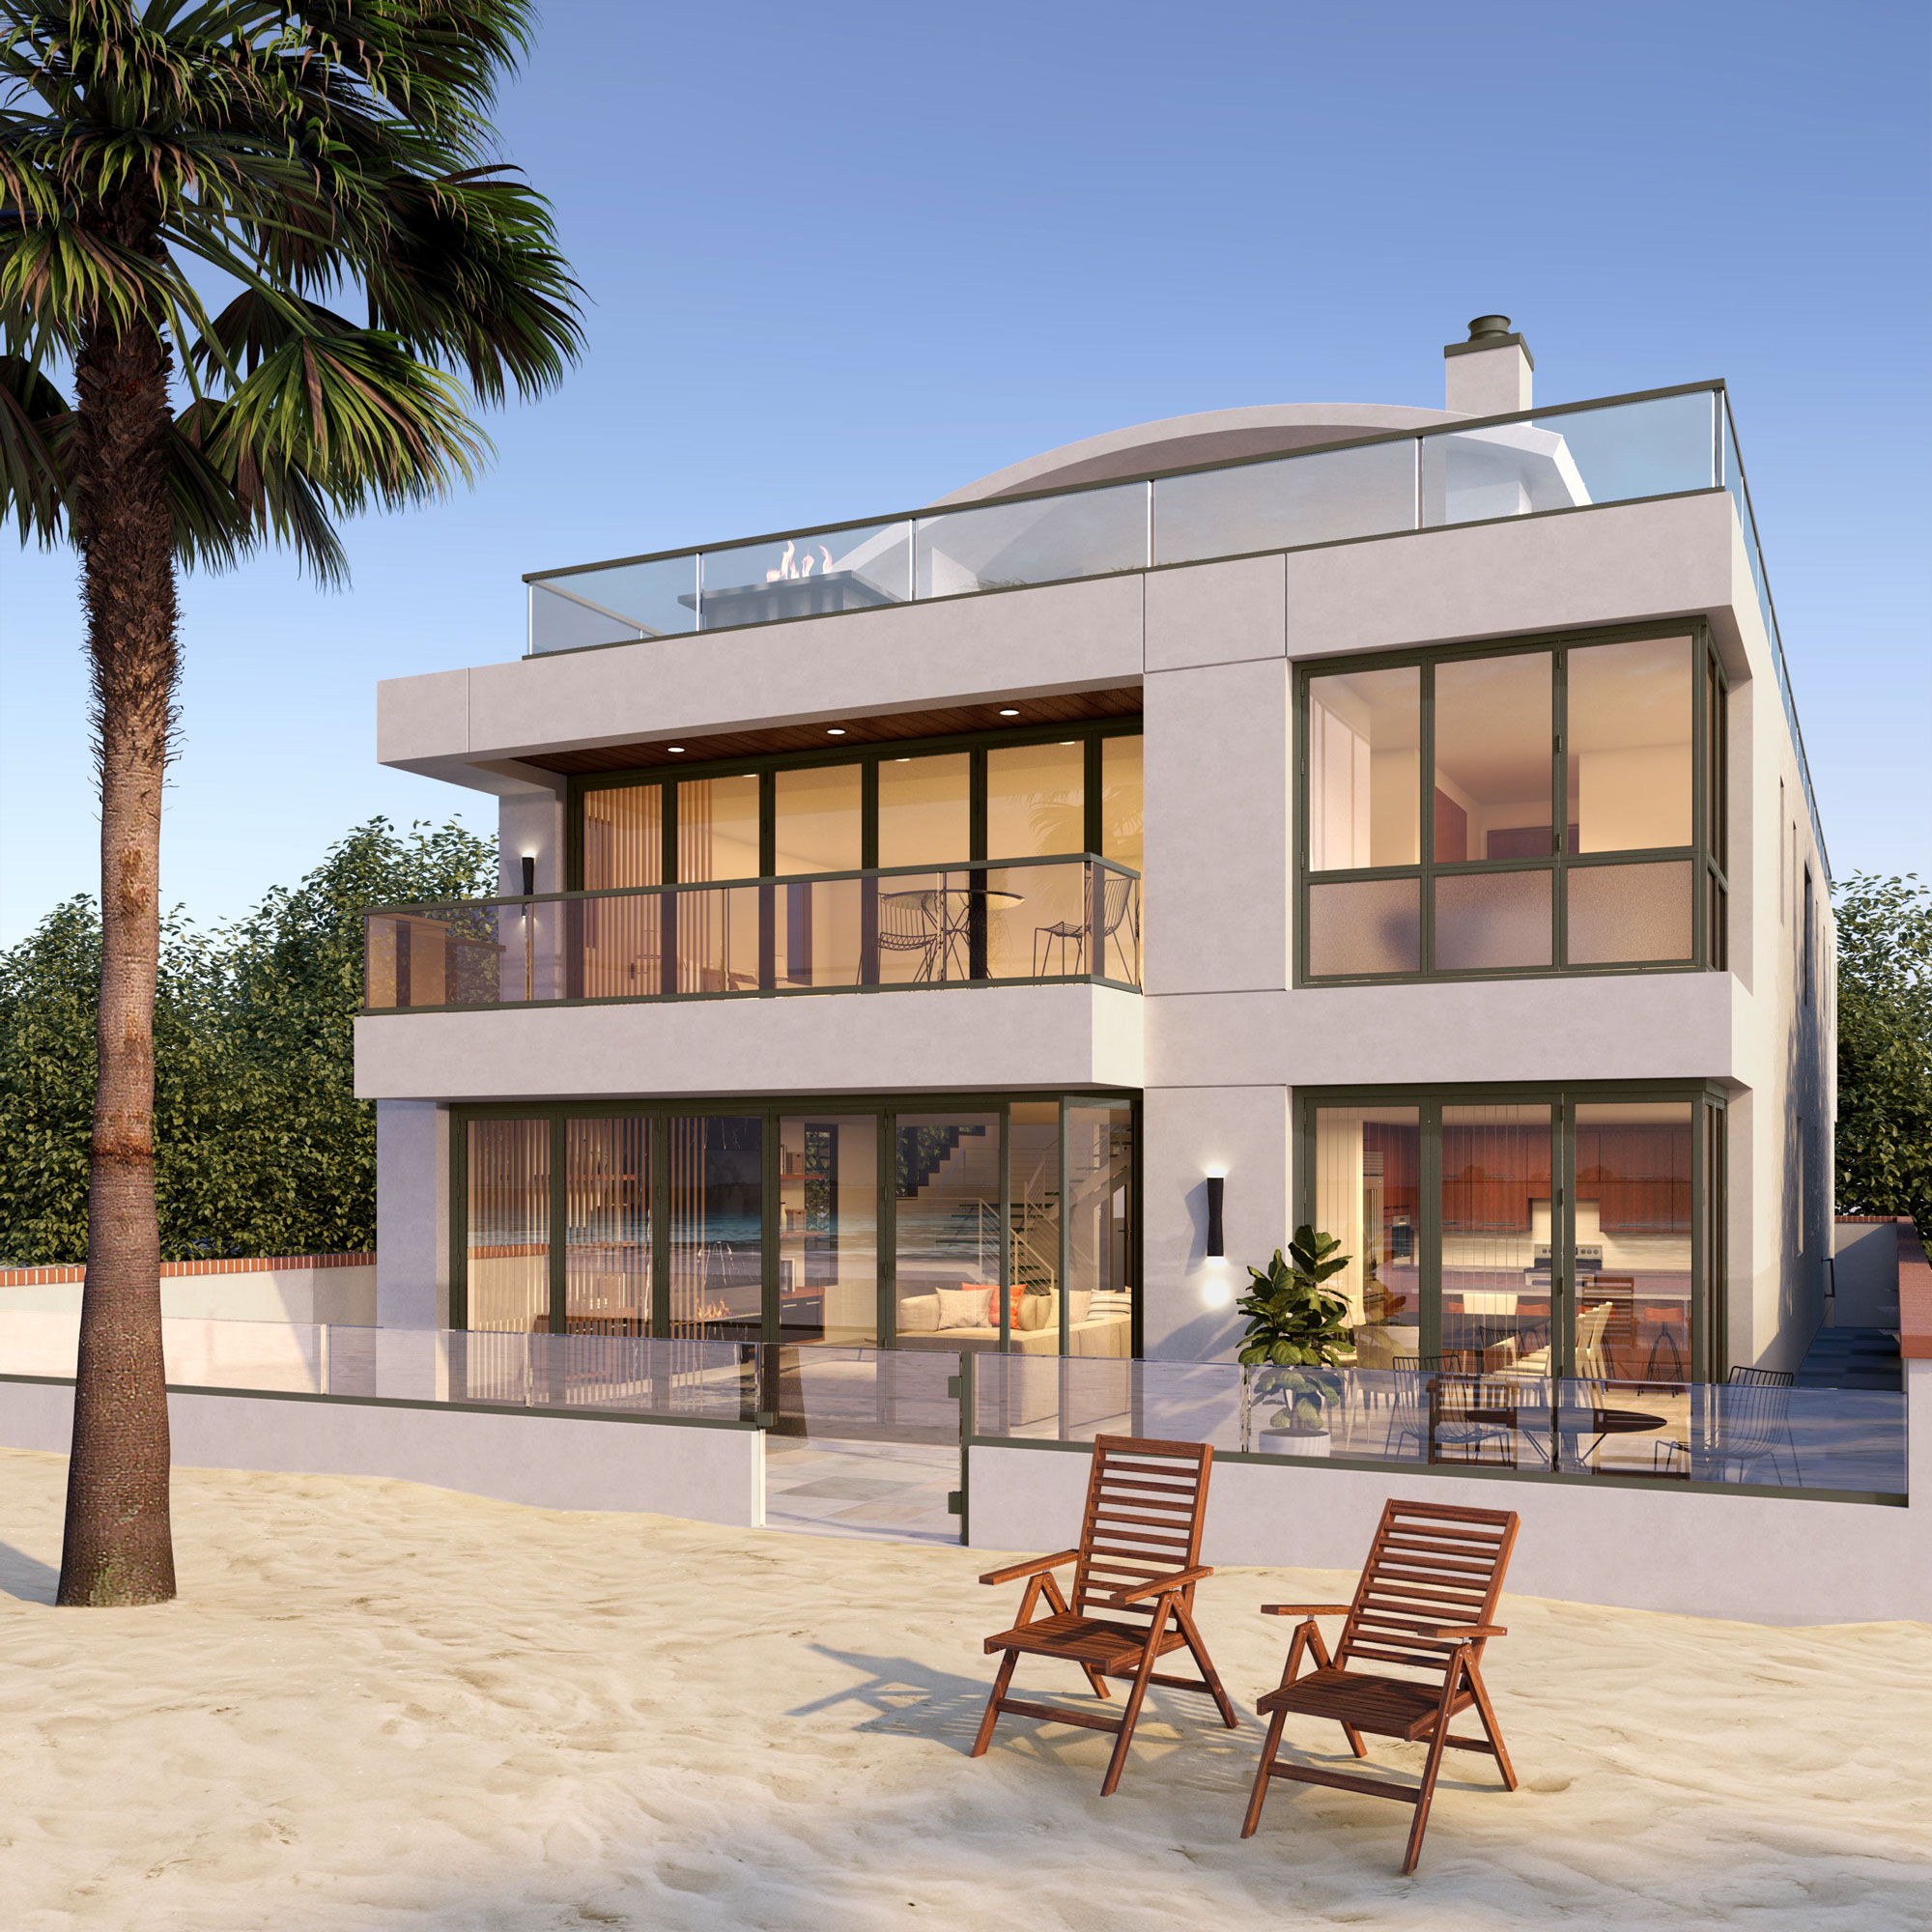 Newport Beach - Contemporary Beach House